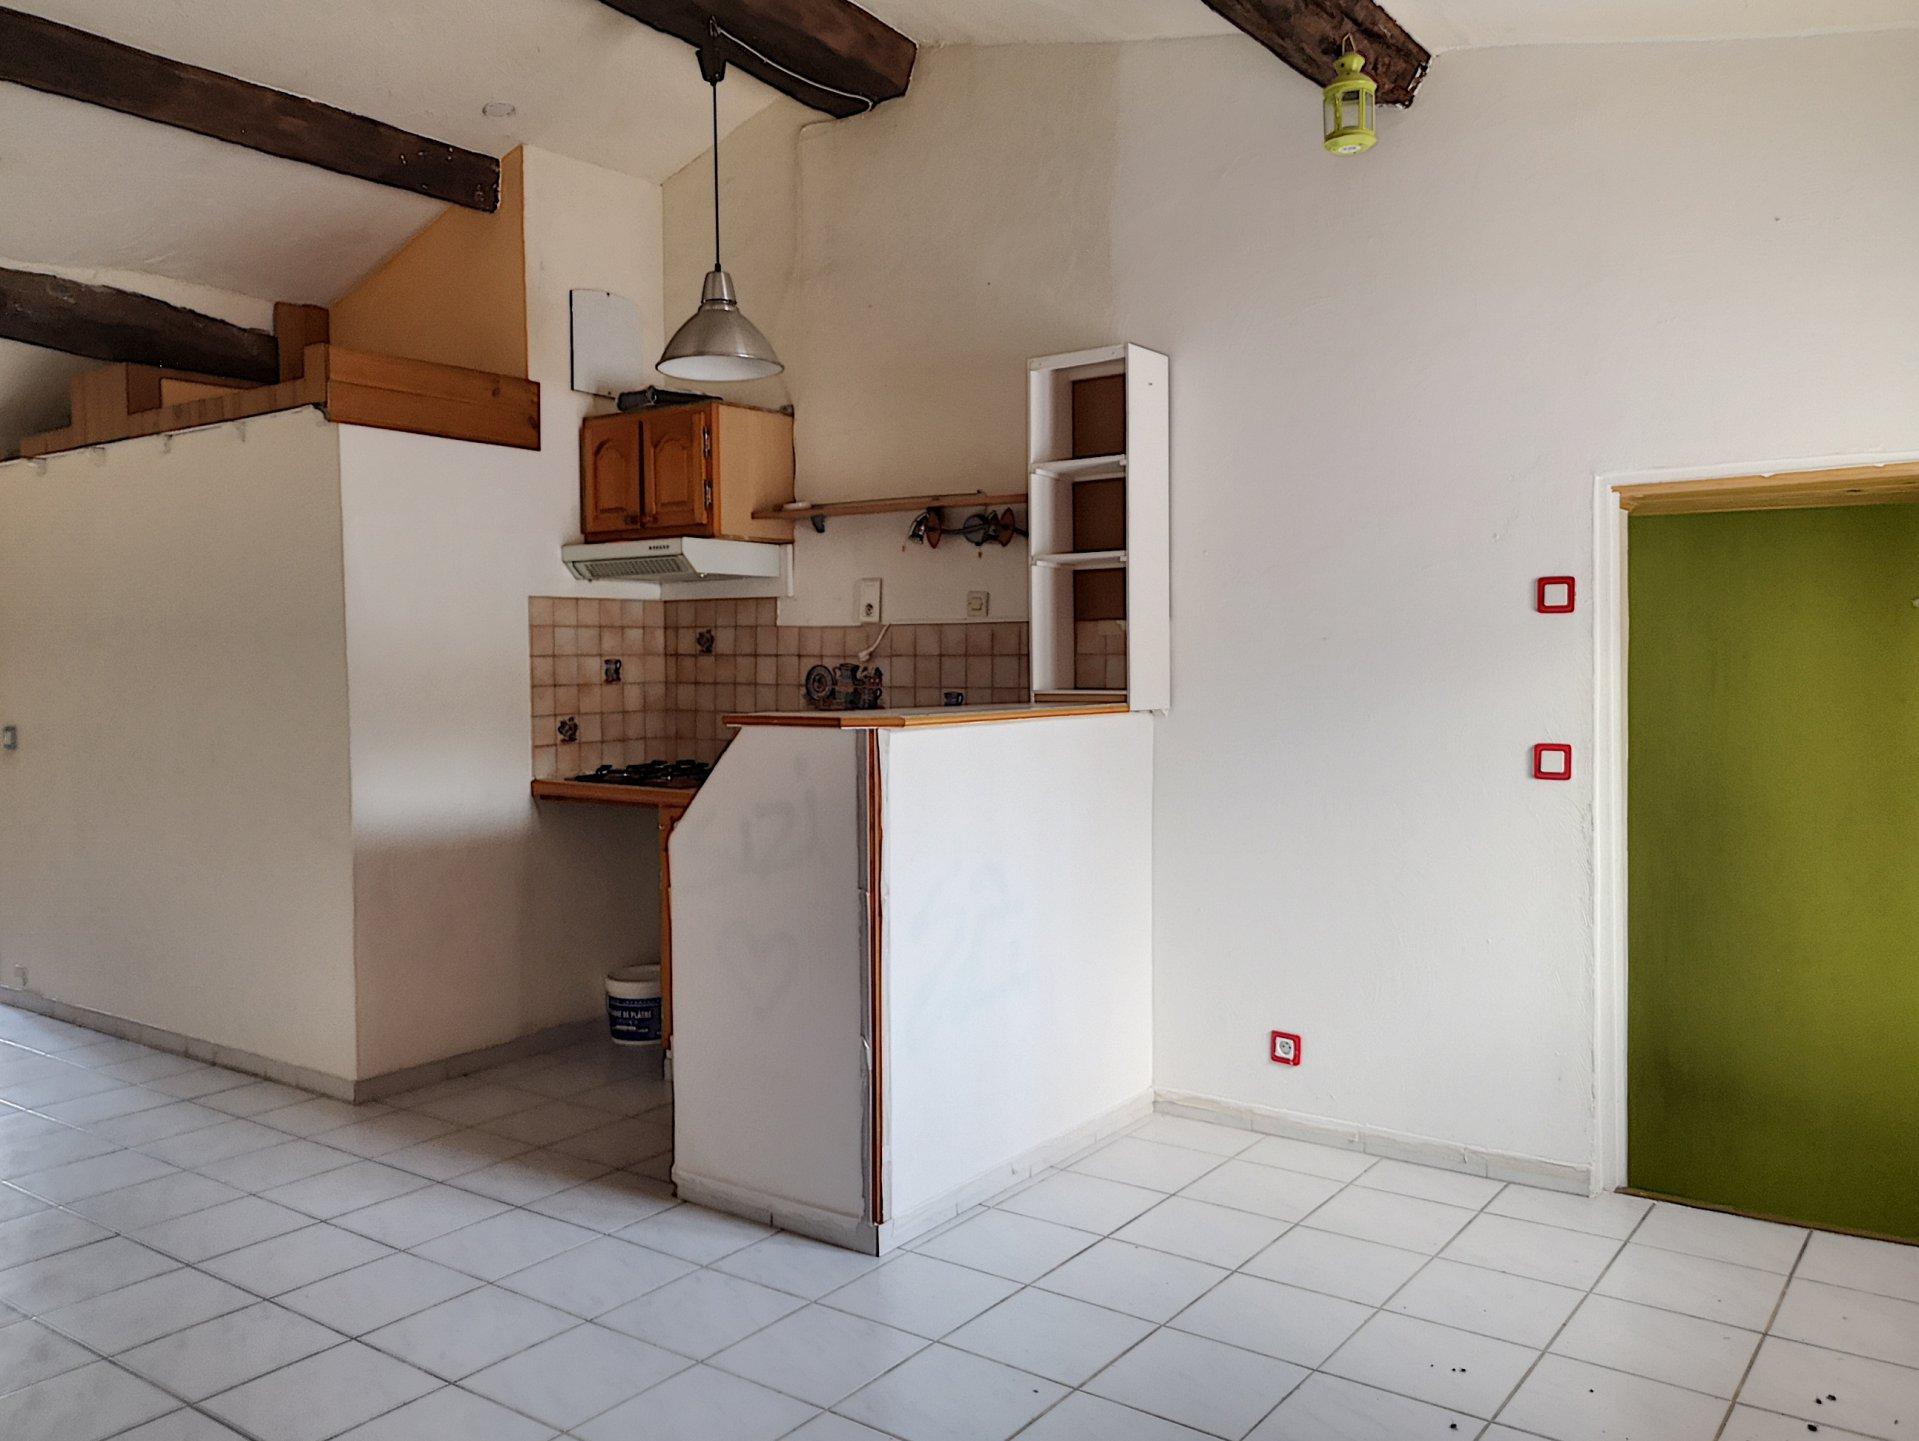 LE BROC (06510) - APPARTEMENT - STUDIO